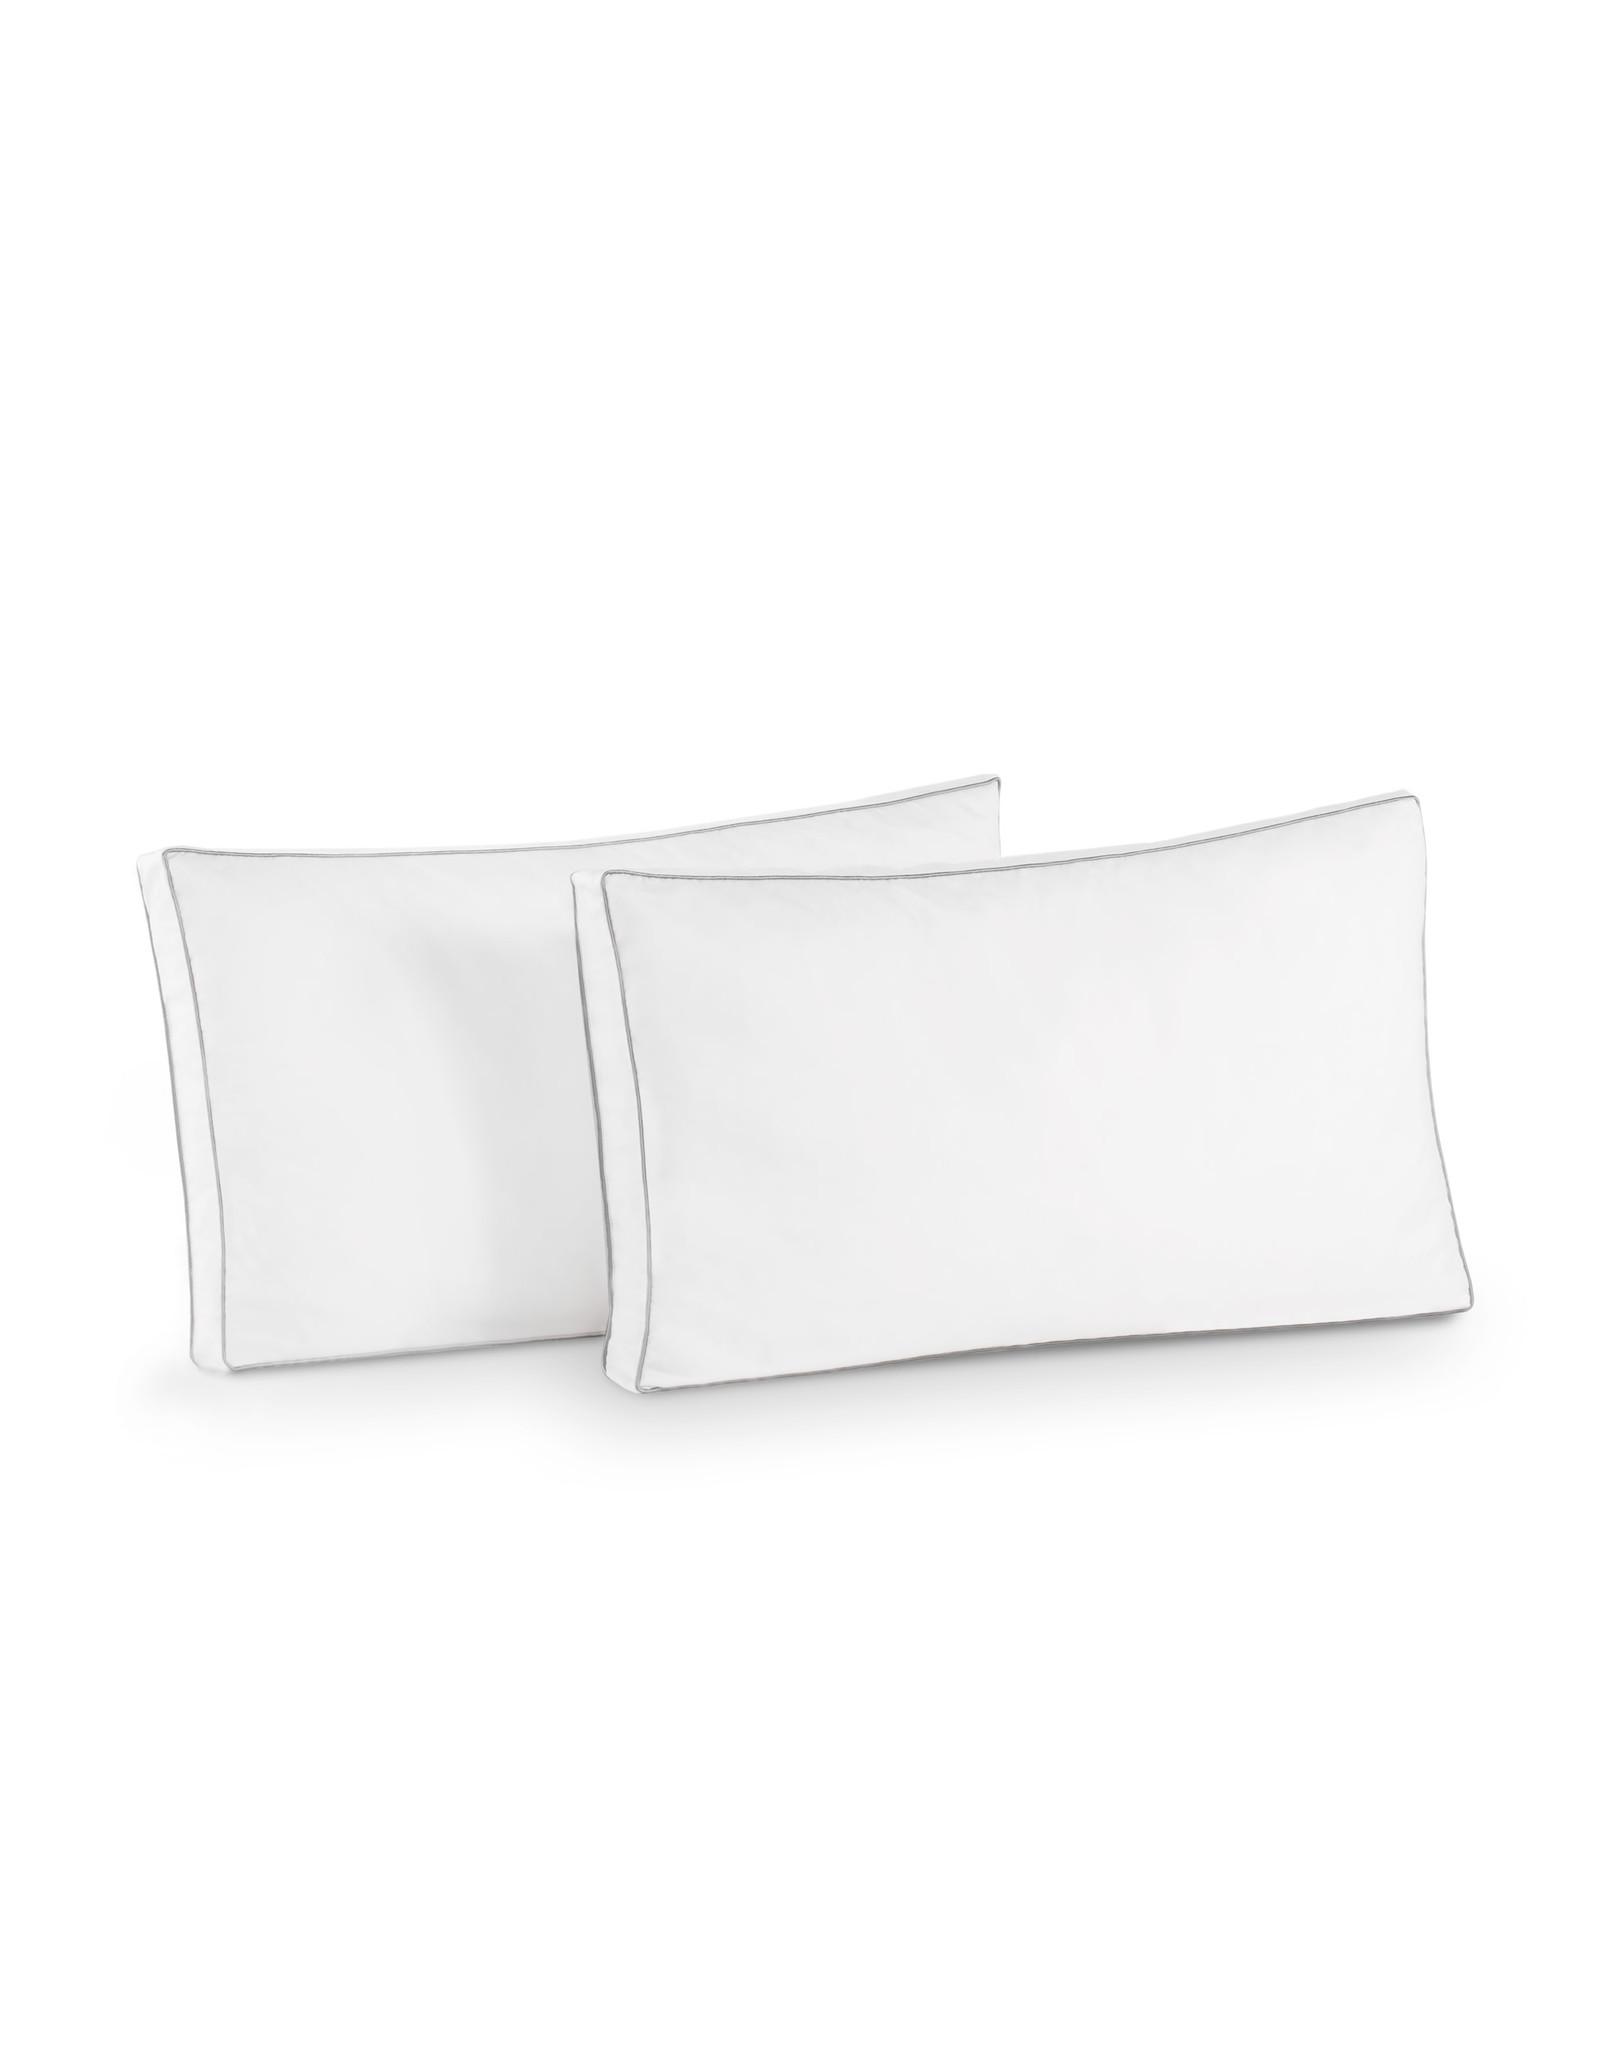 WKQQ02SD 2-pack Queen Shredded Memory Foam pillow